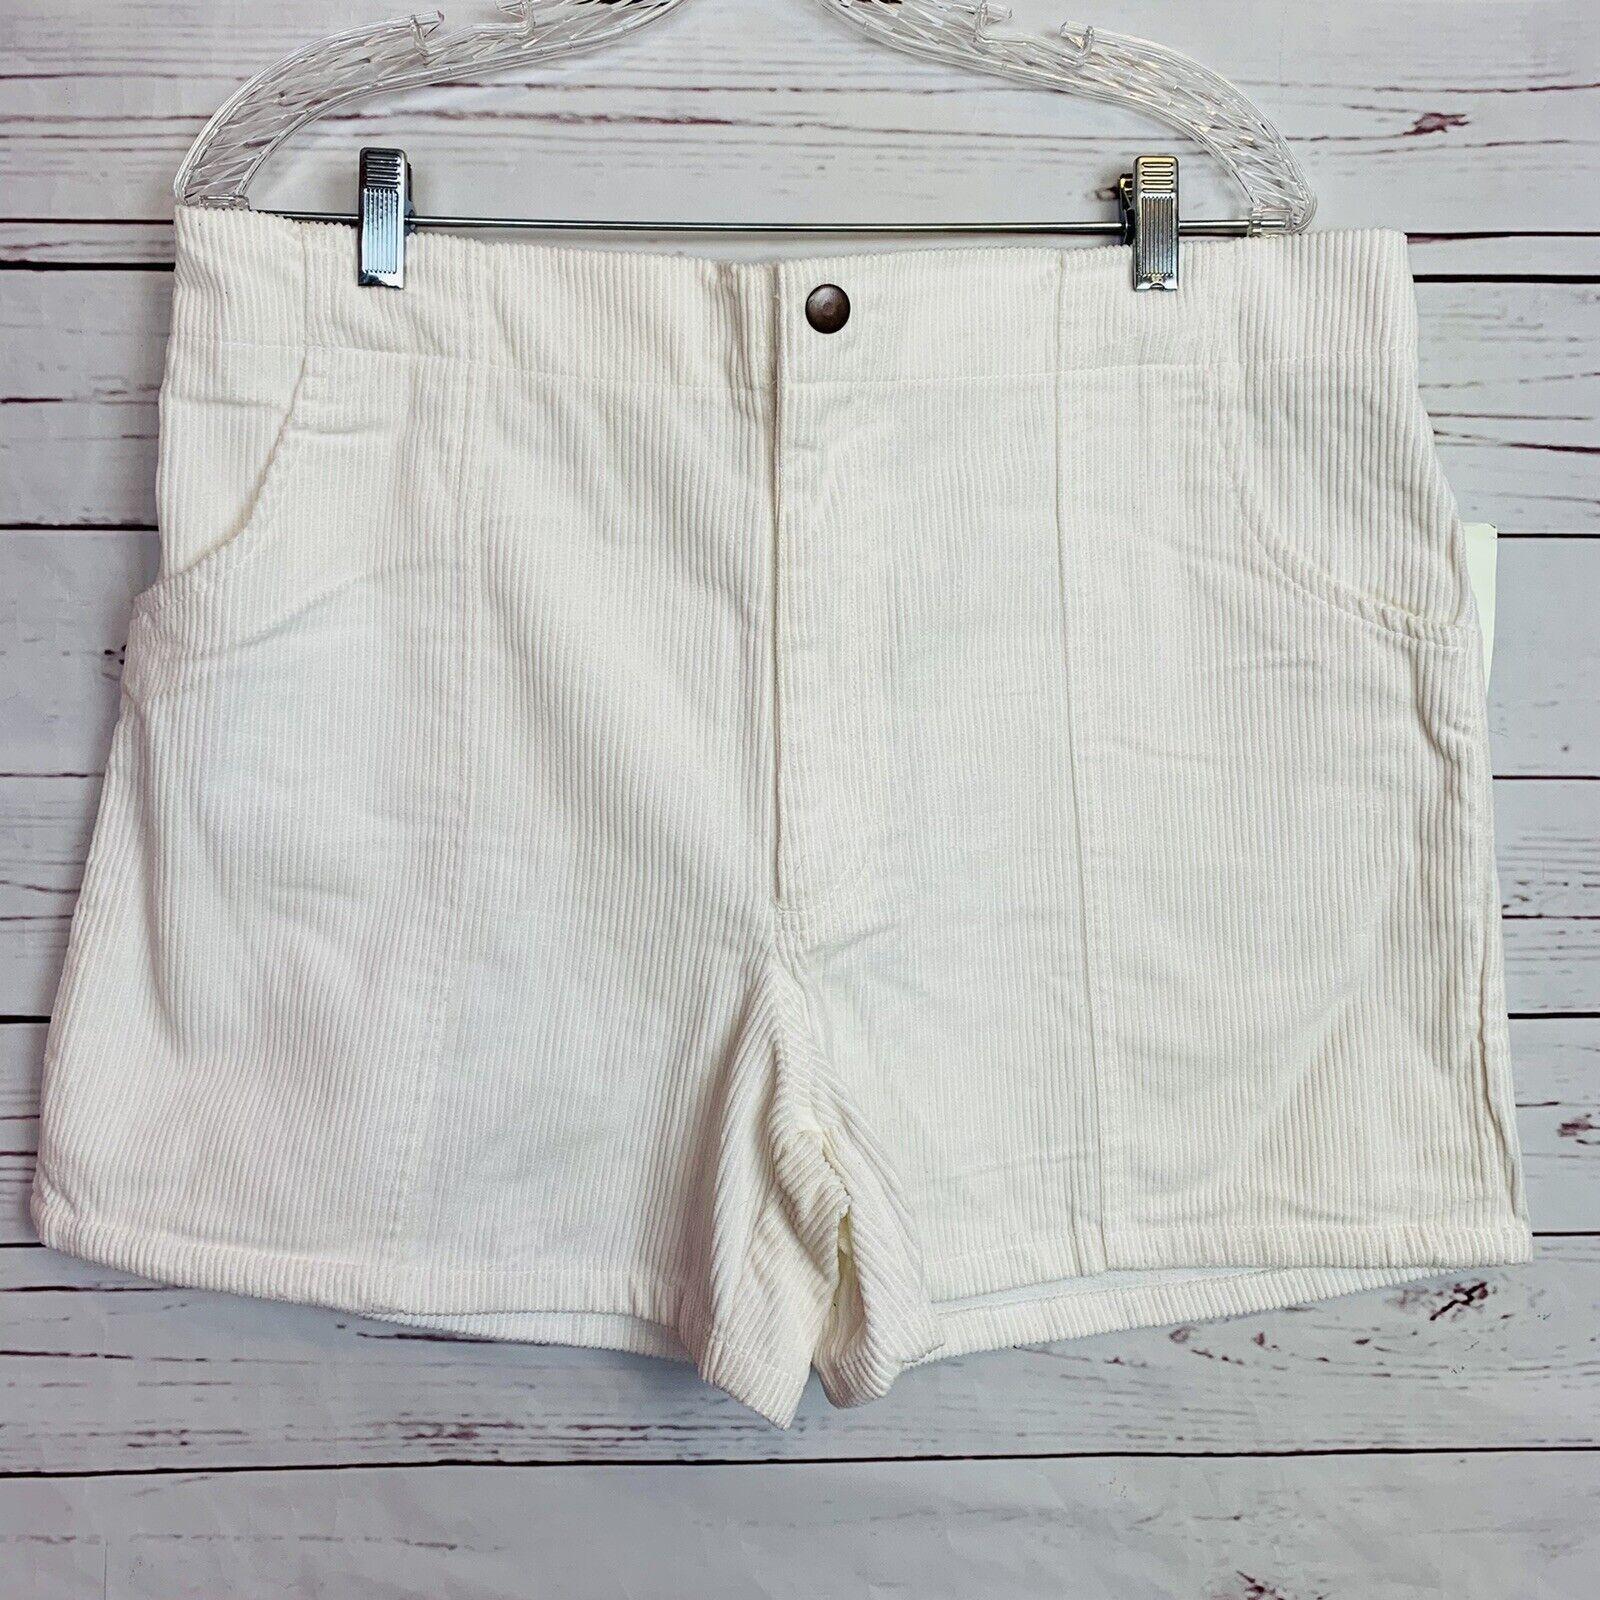 Vintage White Corduroy Classics OP Style shorts size 36/38